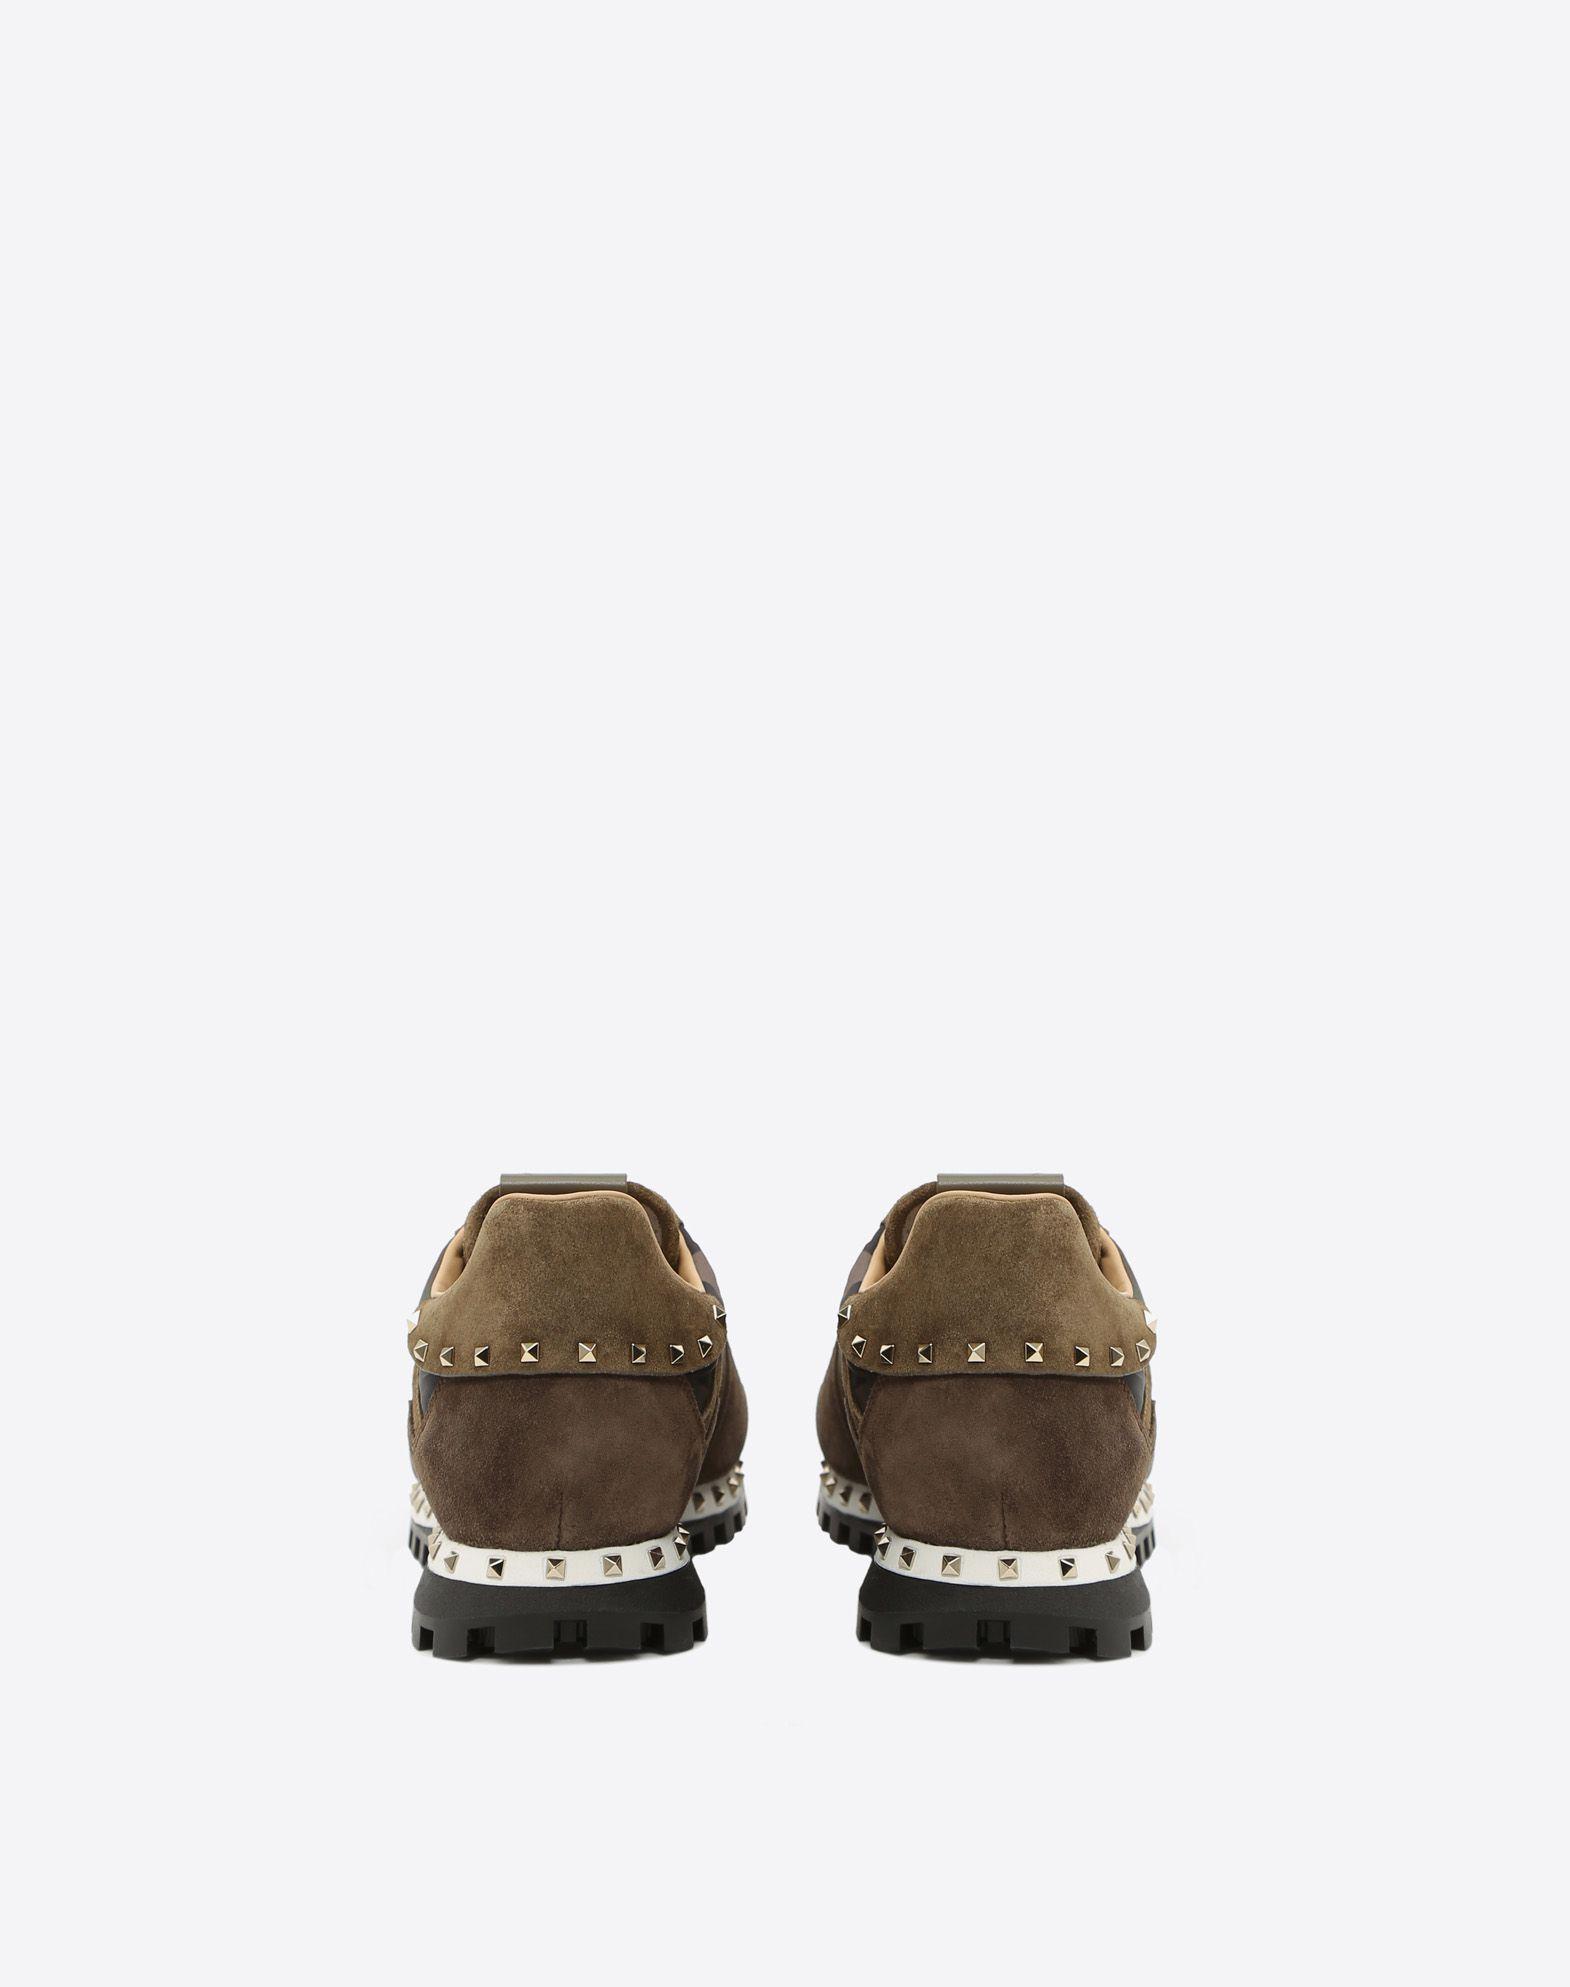 VALENTINO GARAVANI UOMO Camouflage Sneaker LOW-TOP SNEAKERS U d